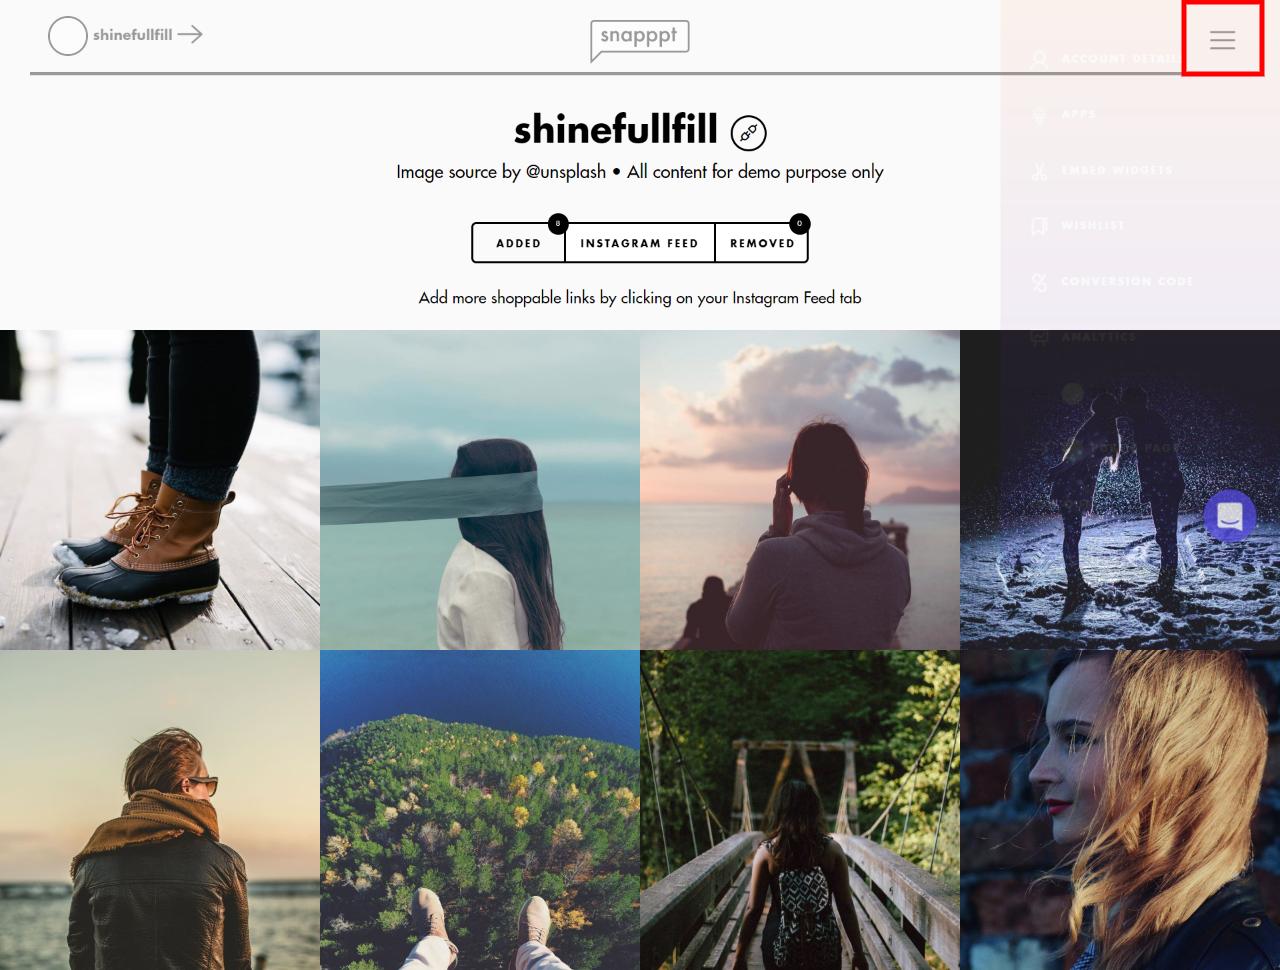 Tingkatkan Penjualan Toko Online Dengan Snapppt - Instagram Shop